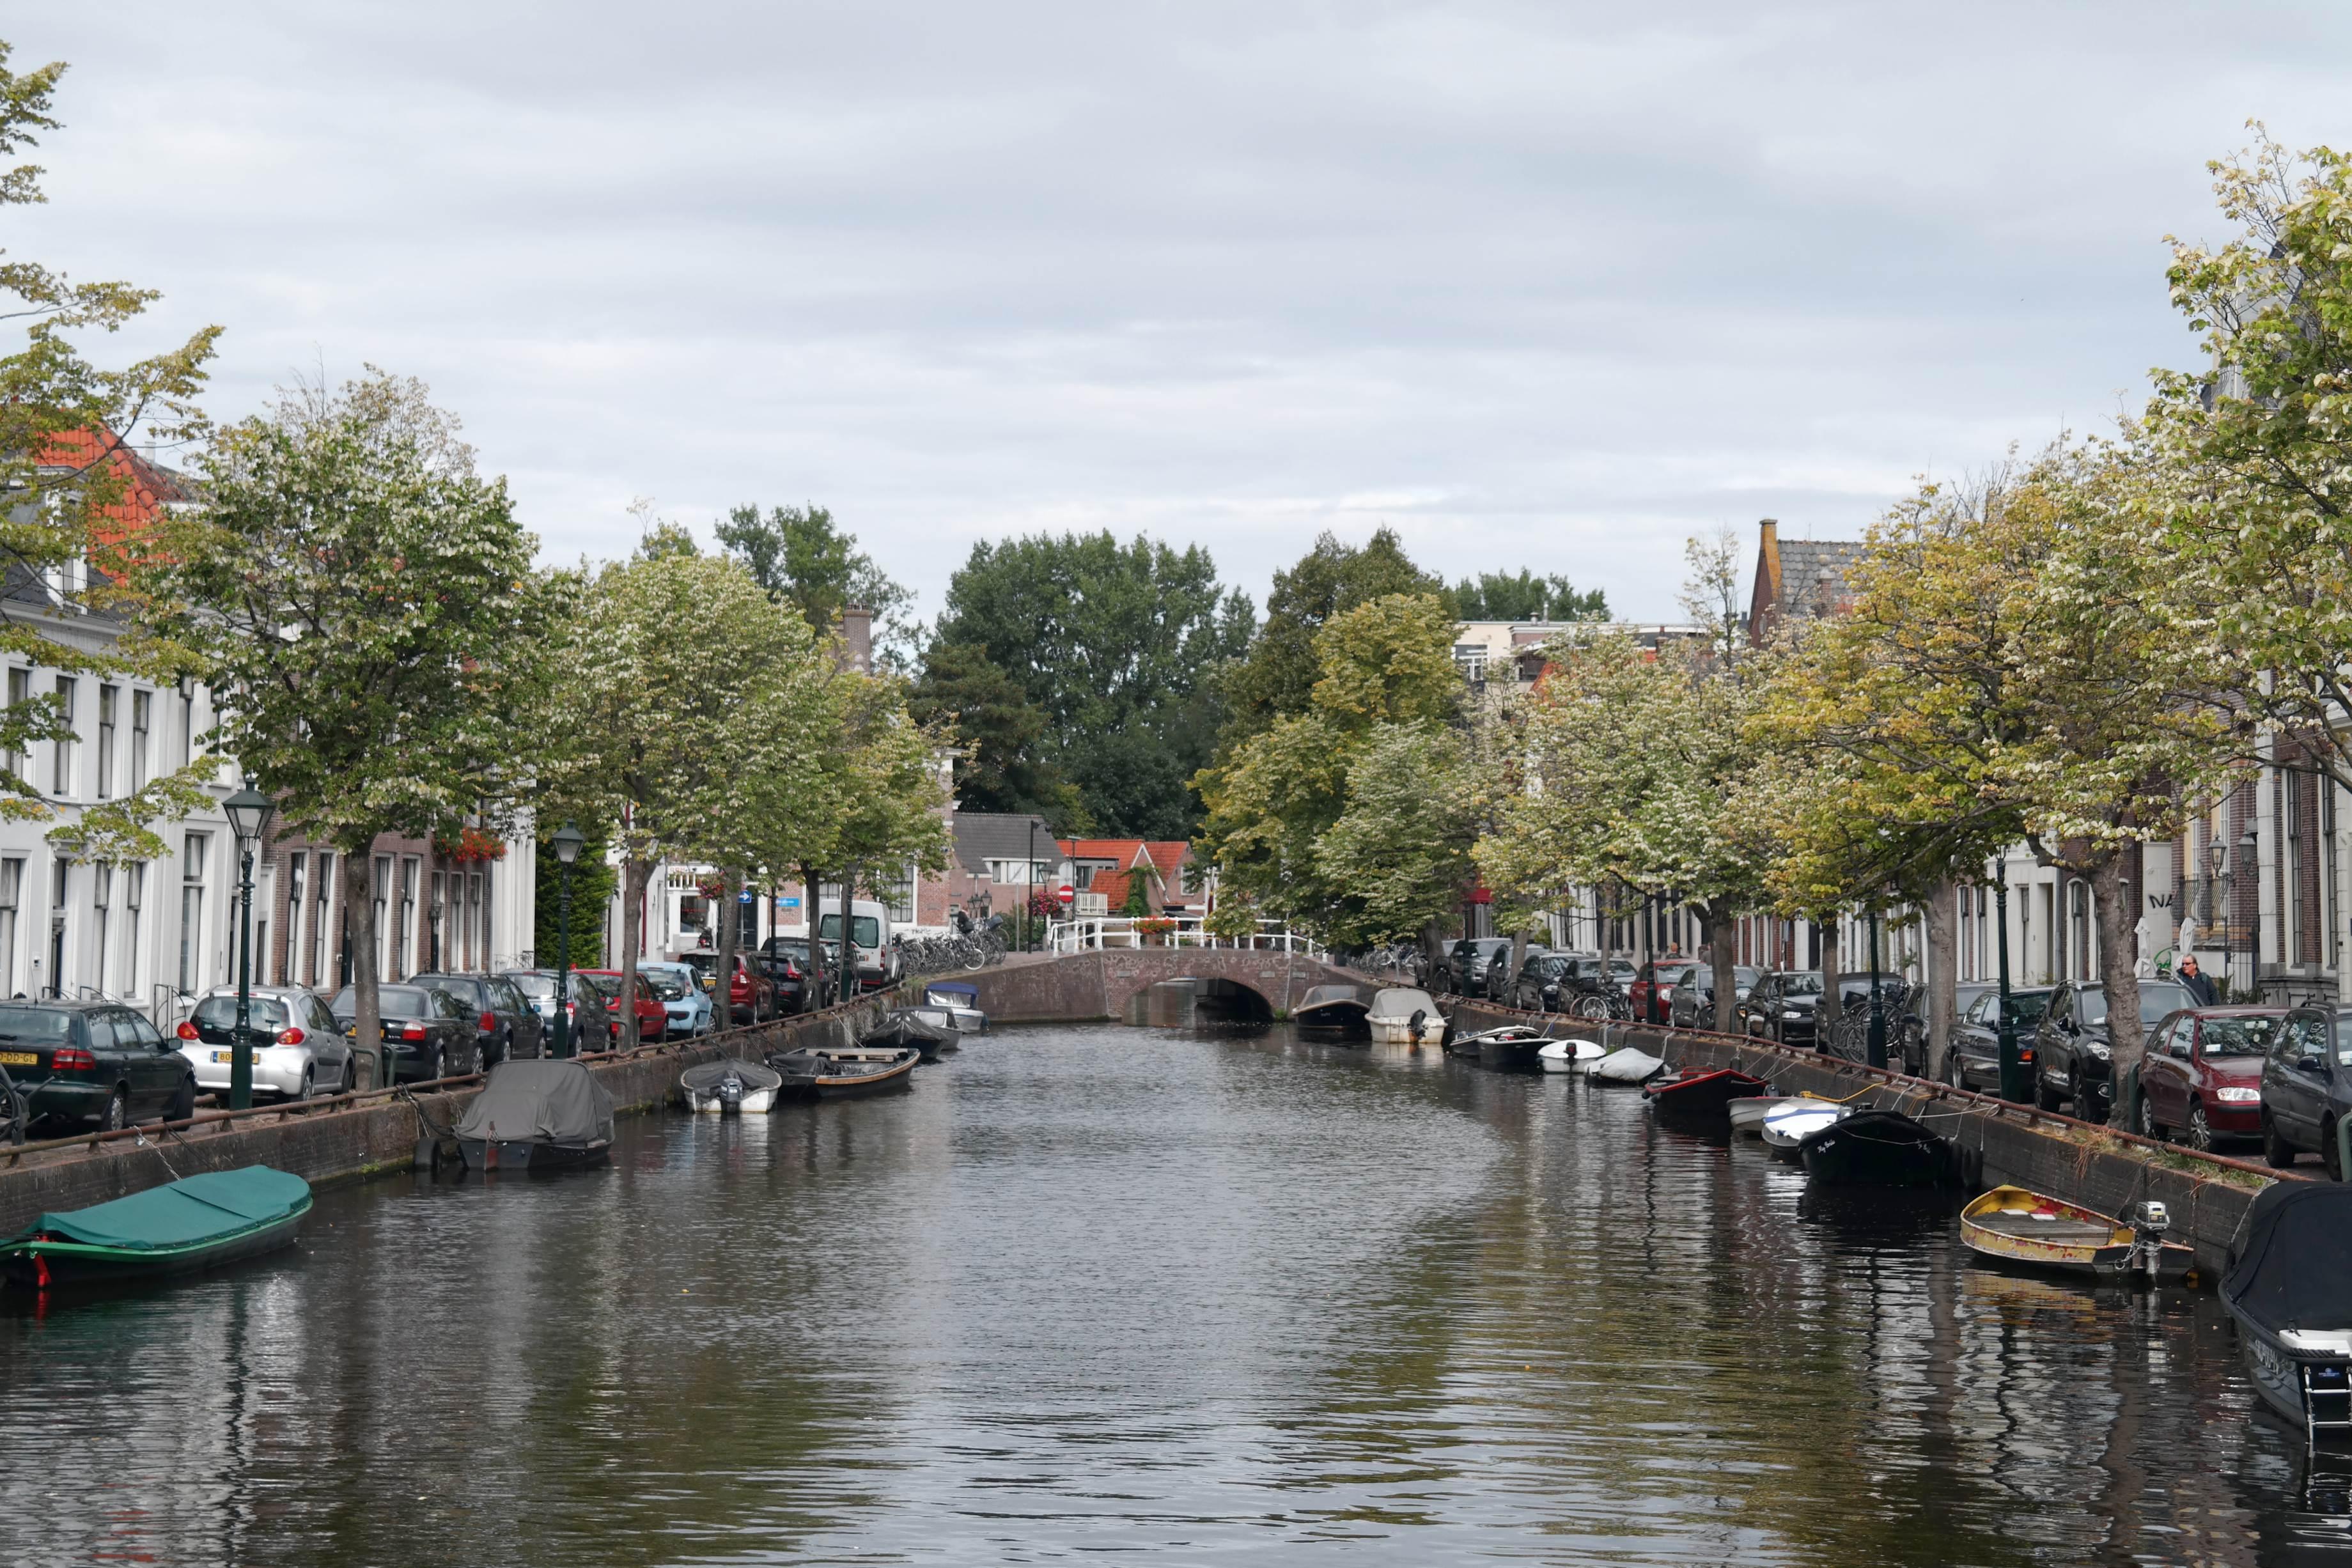 Tag in Alkmaar Tipps